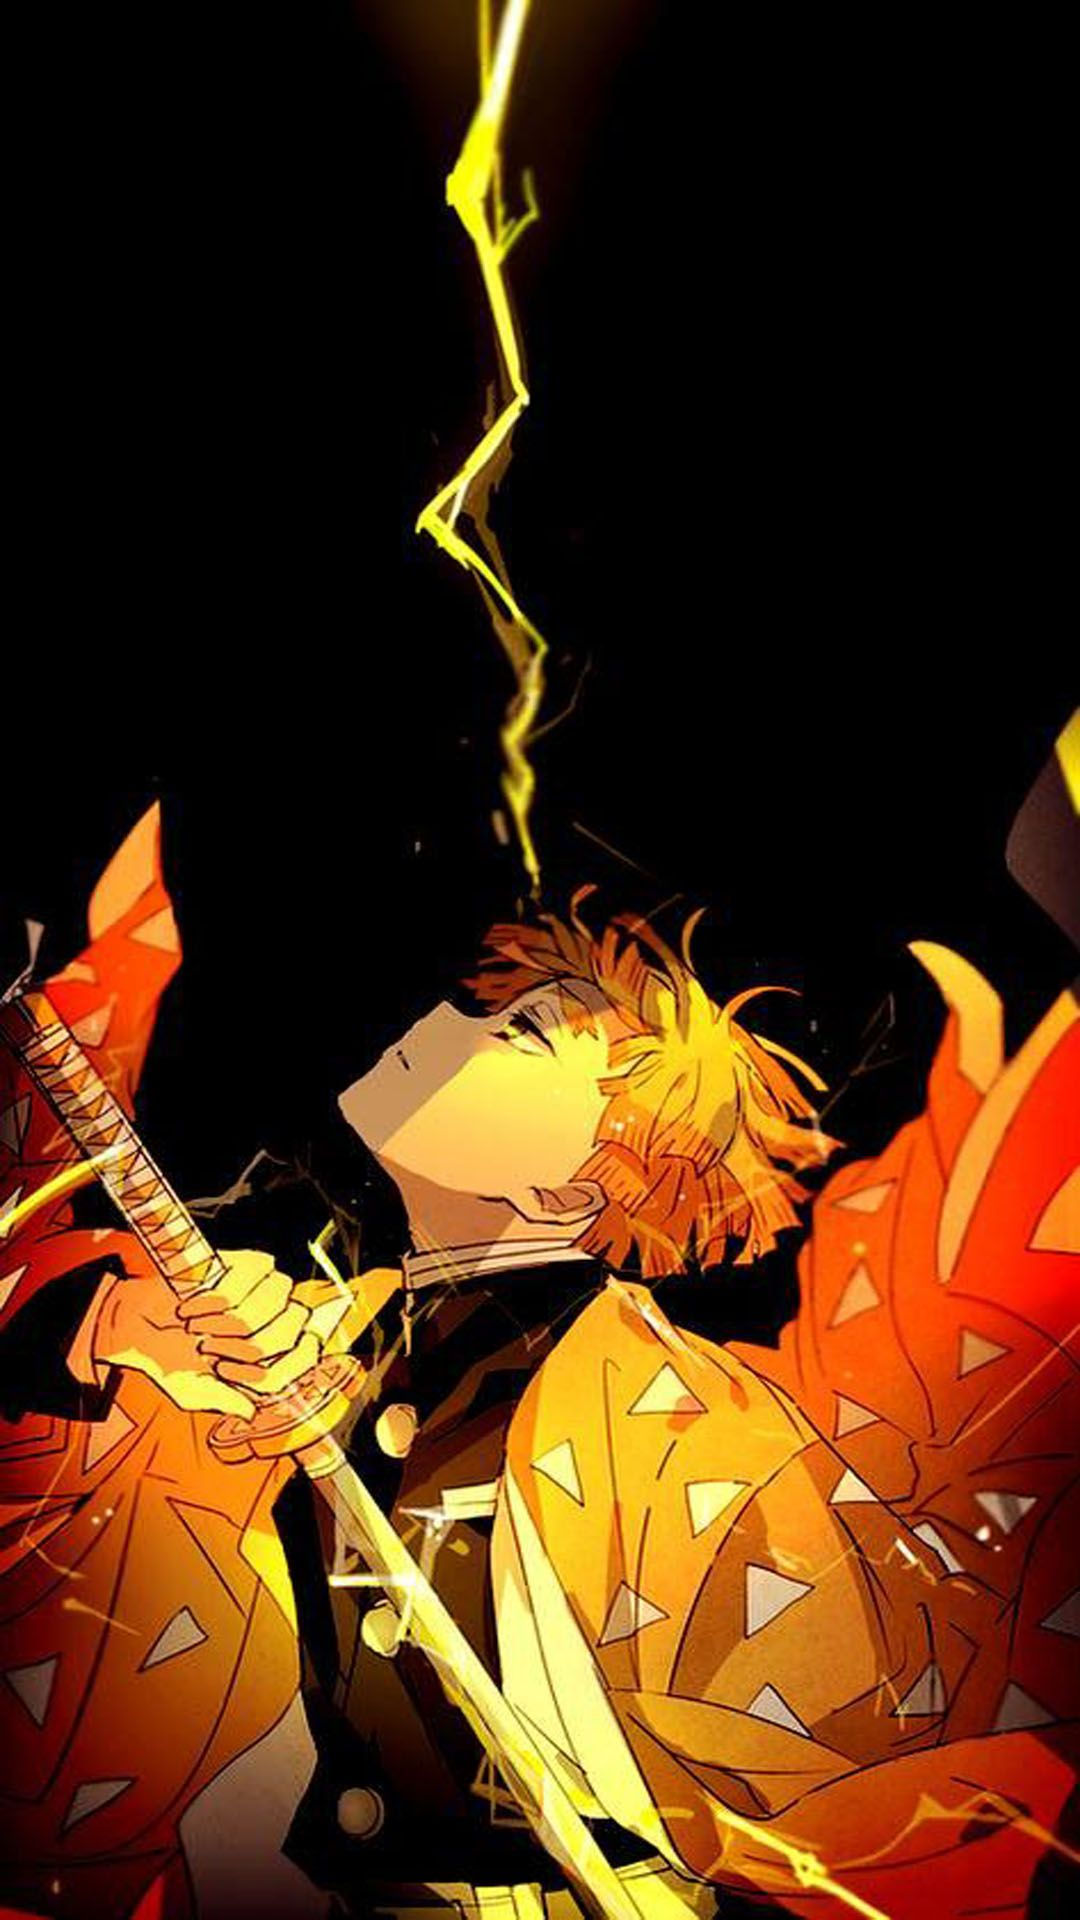 Agatsuma Zenitsu Mobile Wallpaper In 2020 Anime Demon Anime Wallpaper Slayer Anime